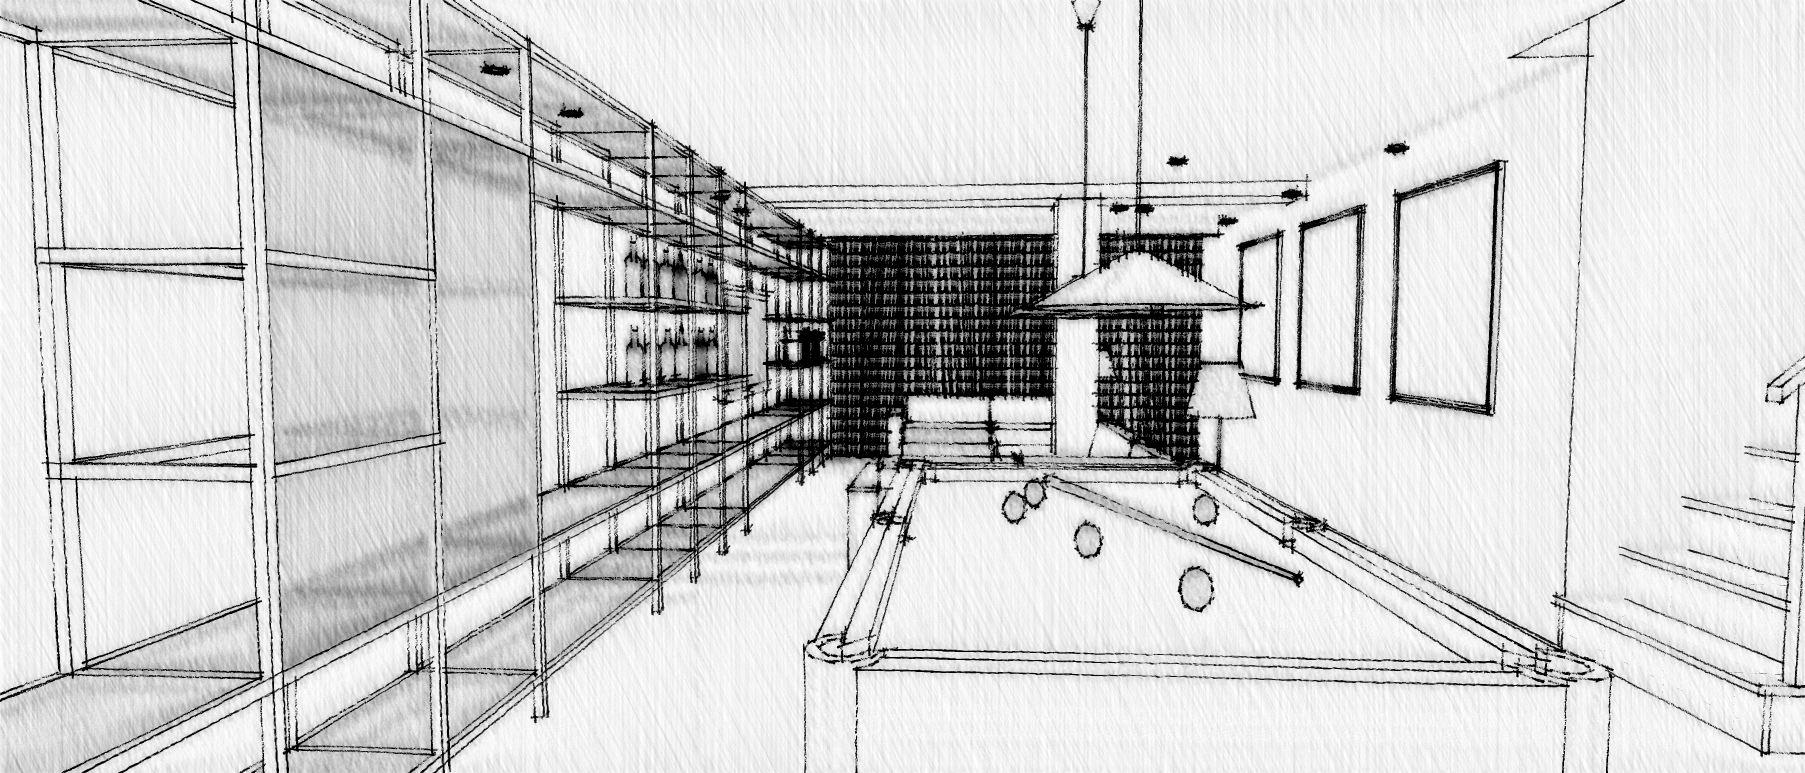 interiorismo cadiz, diseño interiores cadiz, sevilla mañaga